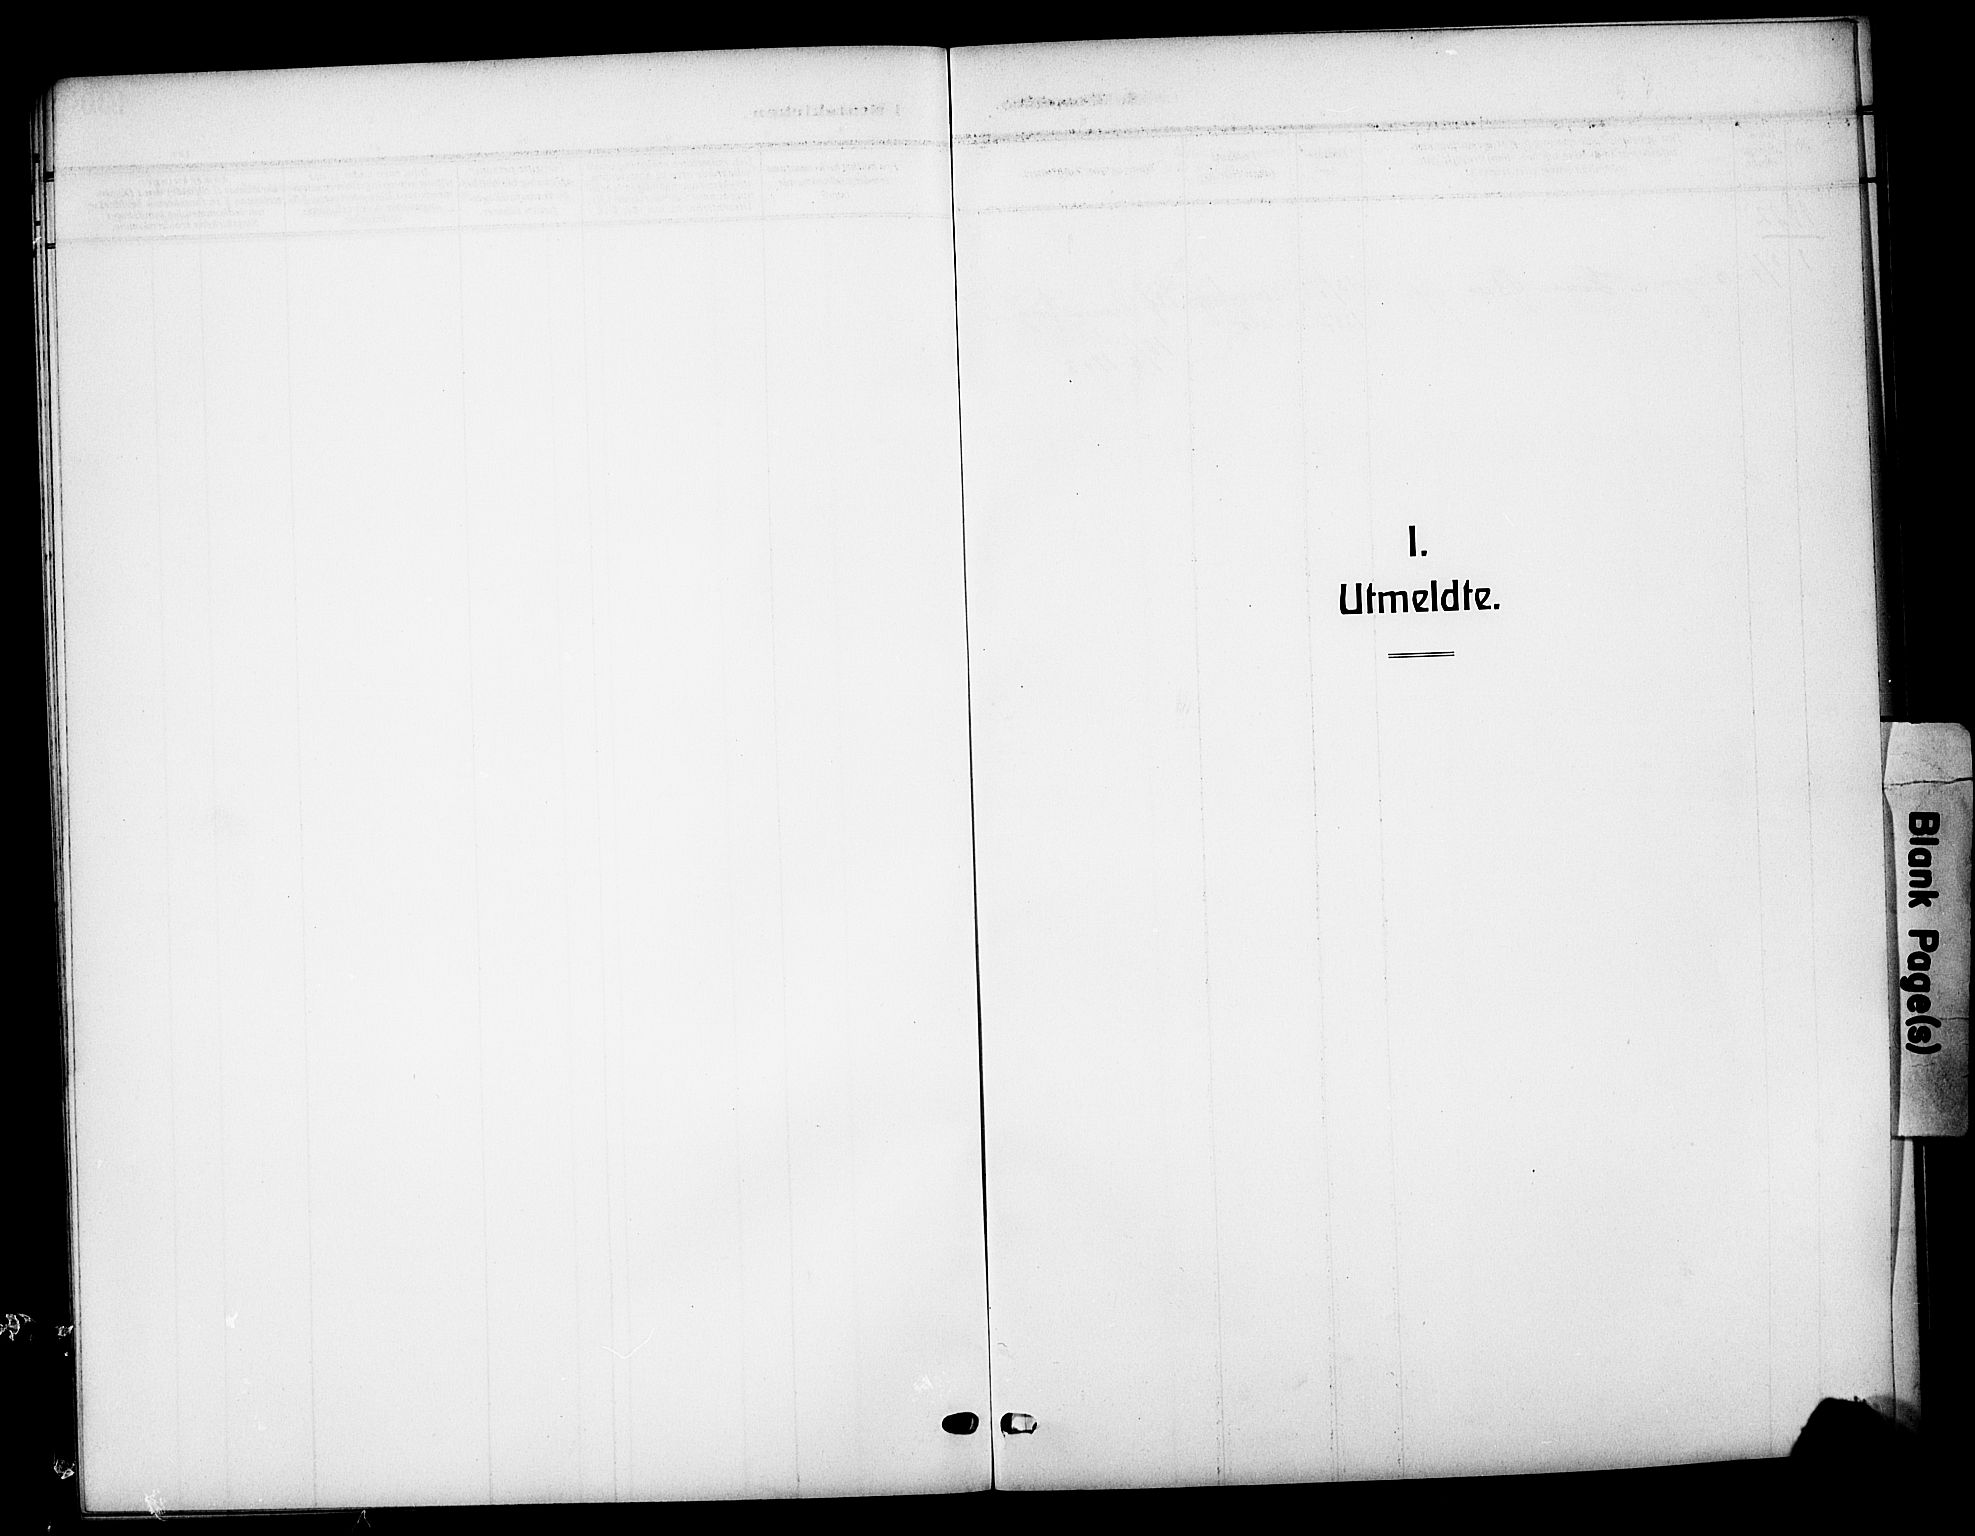 SAH, Vestre Slidre prestekontor, Klokkerbok nr. 7, 1909-1930